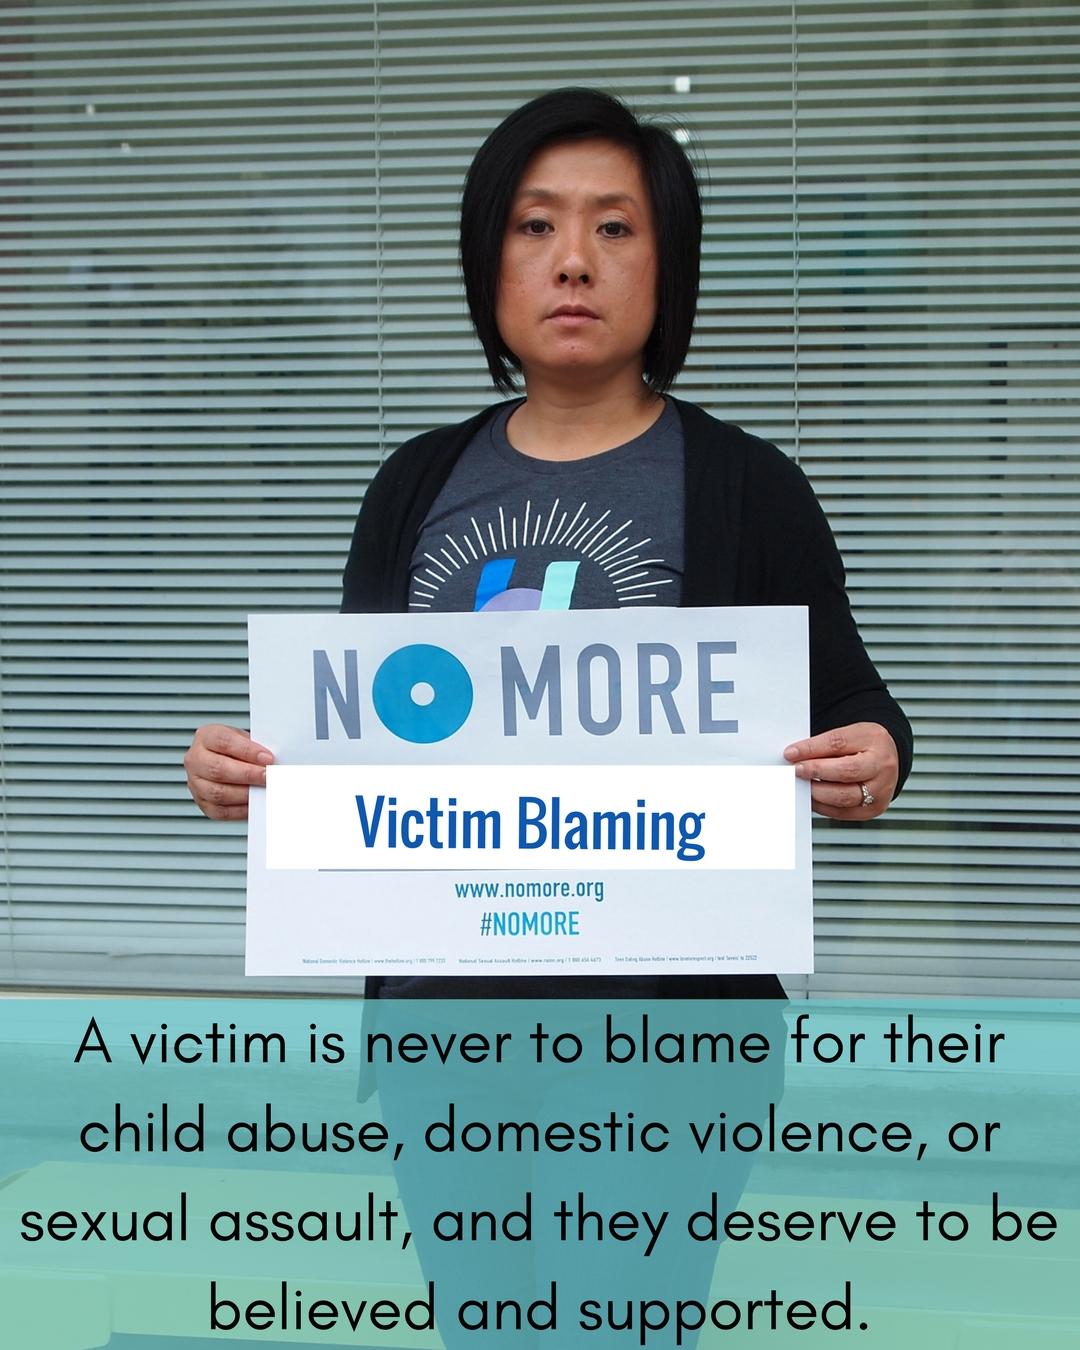 No More Campaign-Victim Blaming